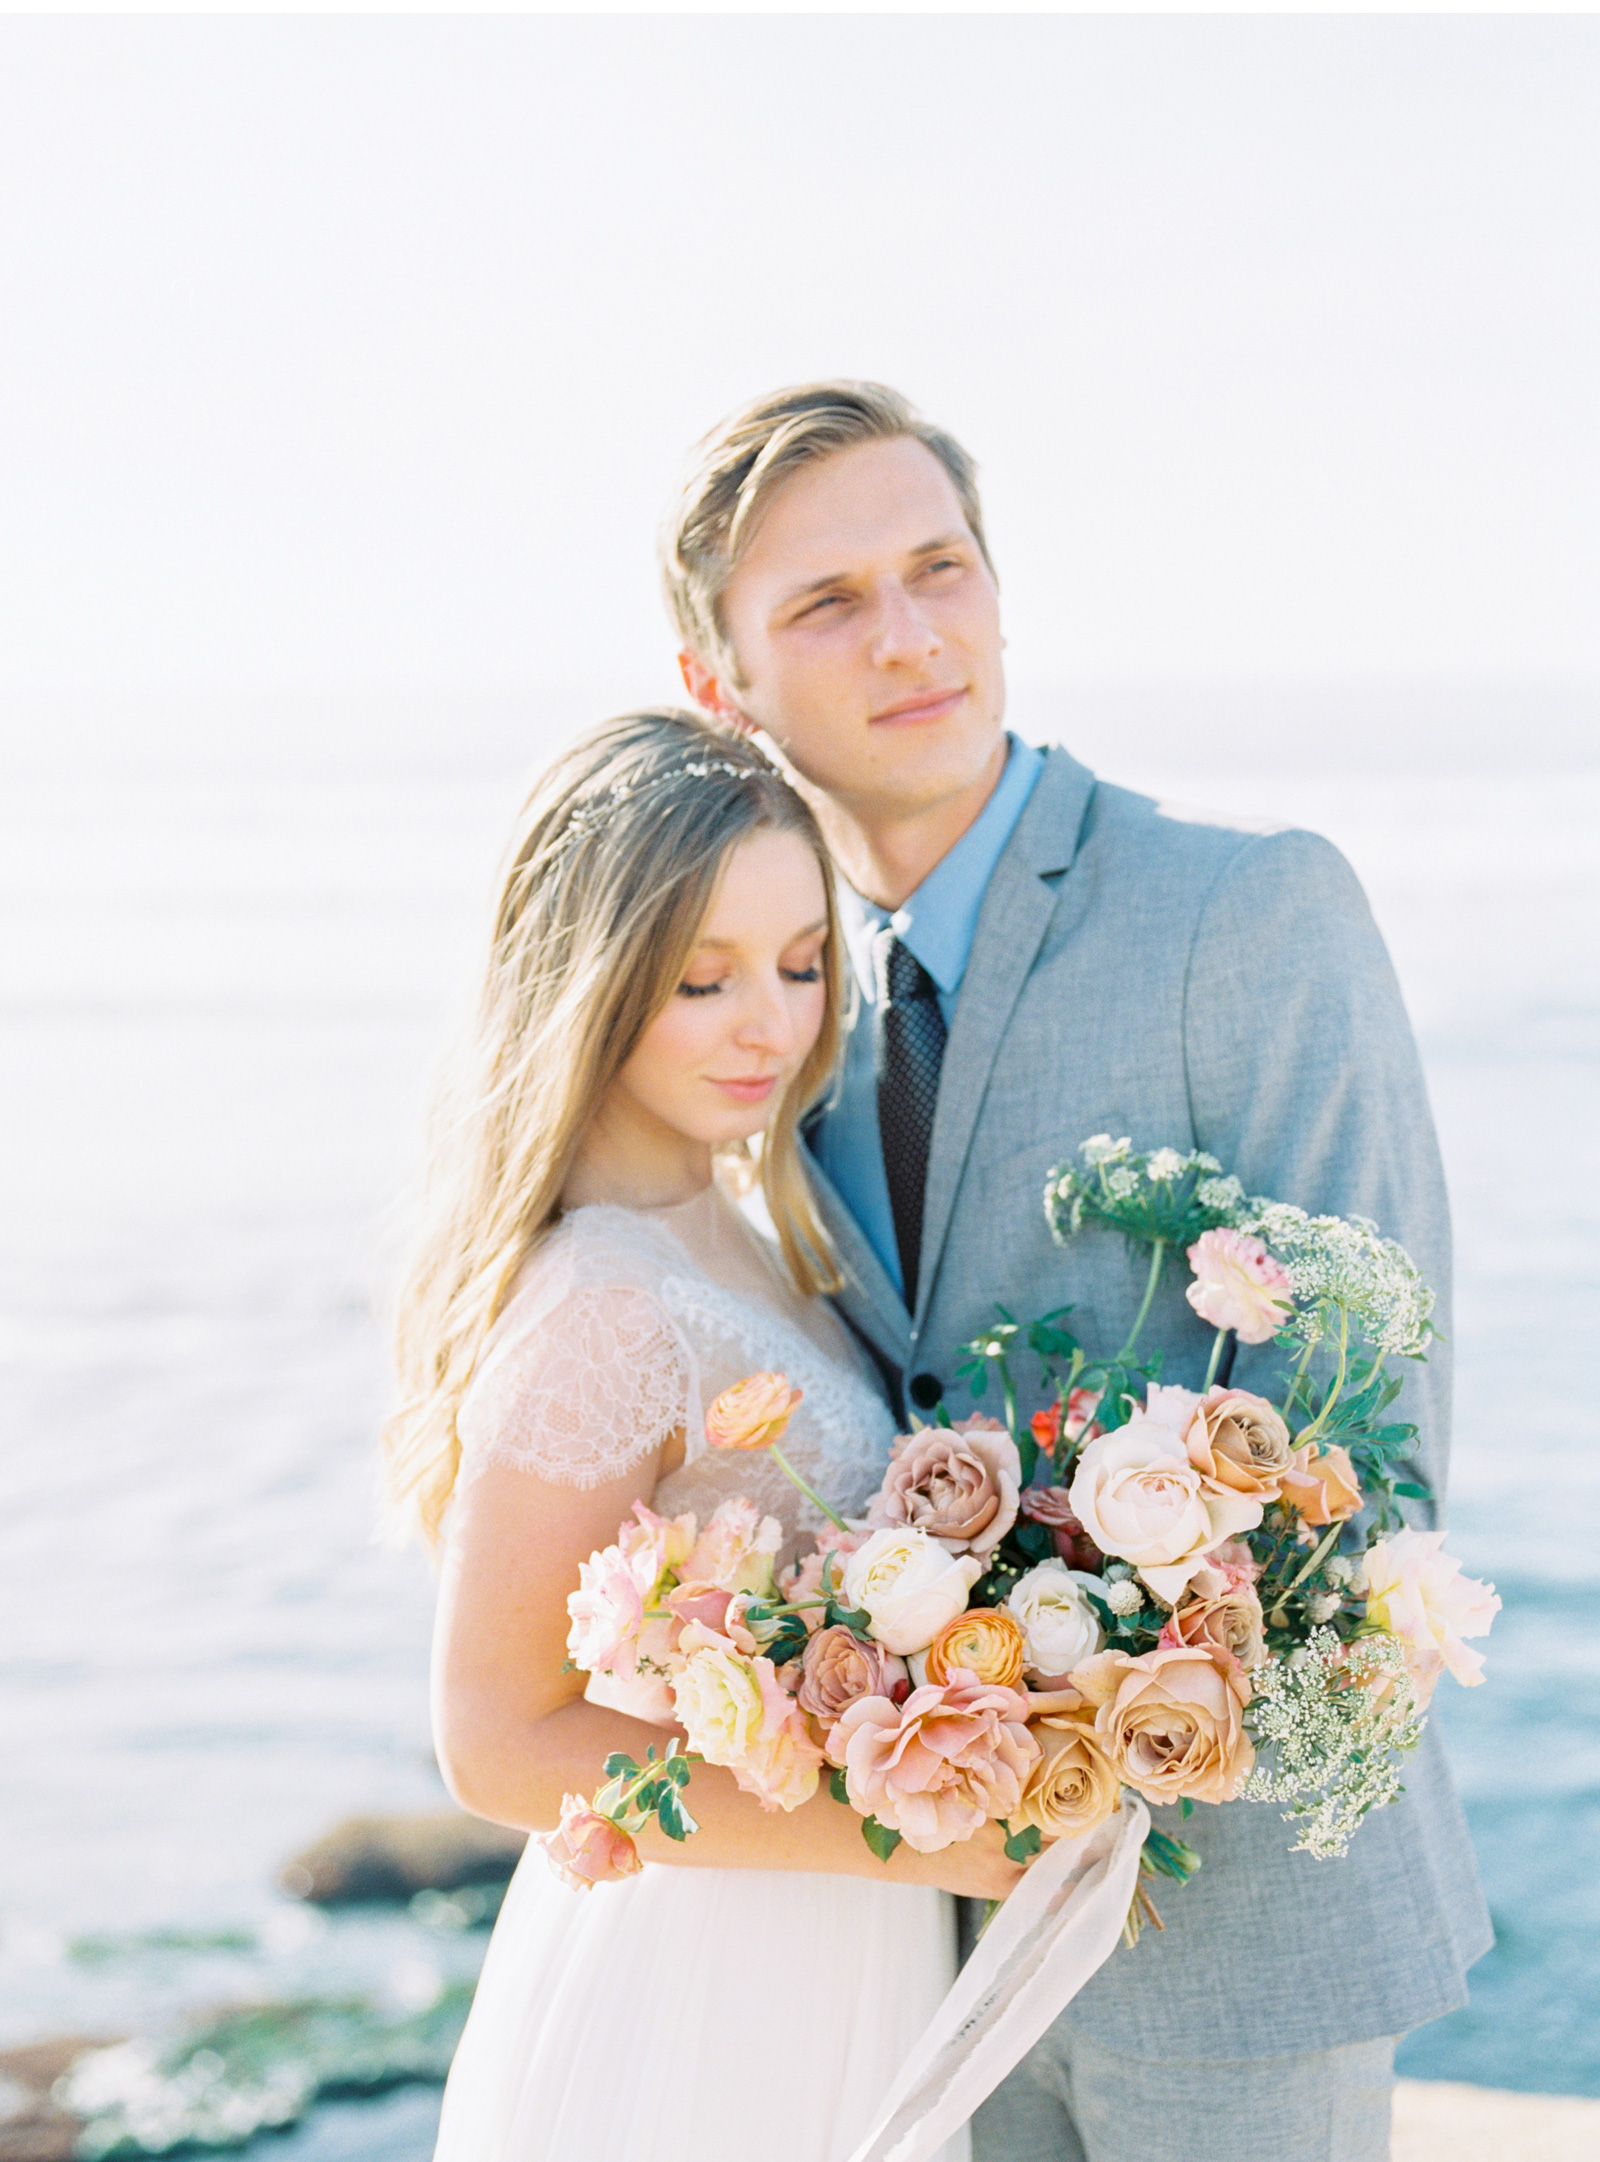 Style-Me-Pretty-California-Beach-Wedding-Natalie-Schutt-Photography_13.jpg